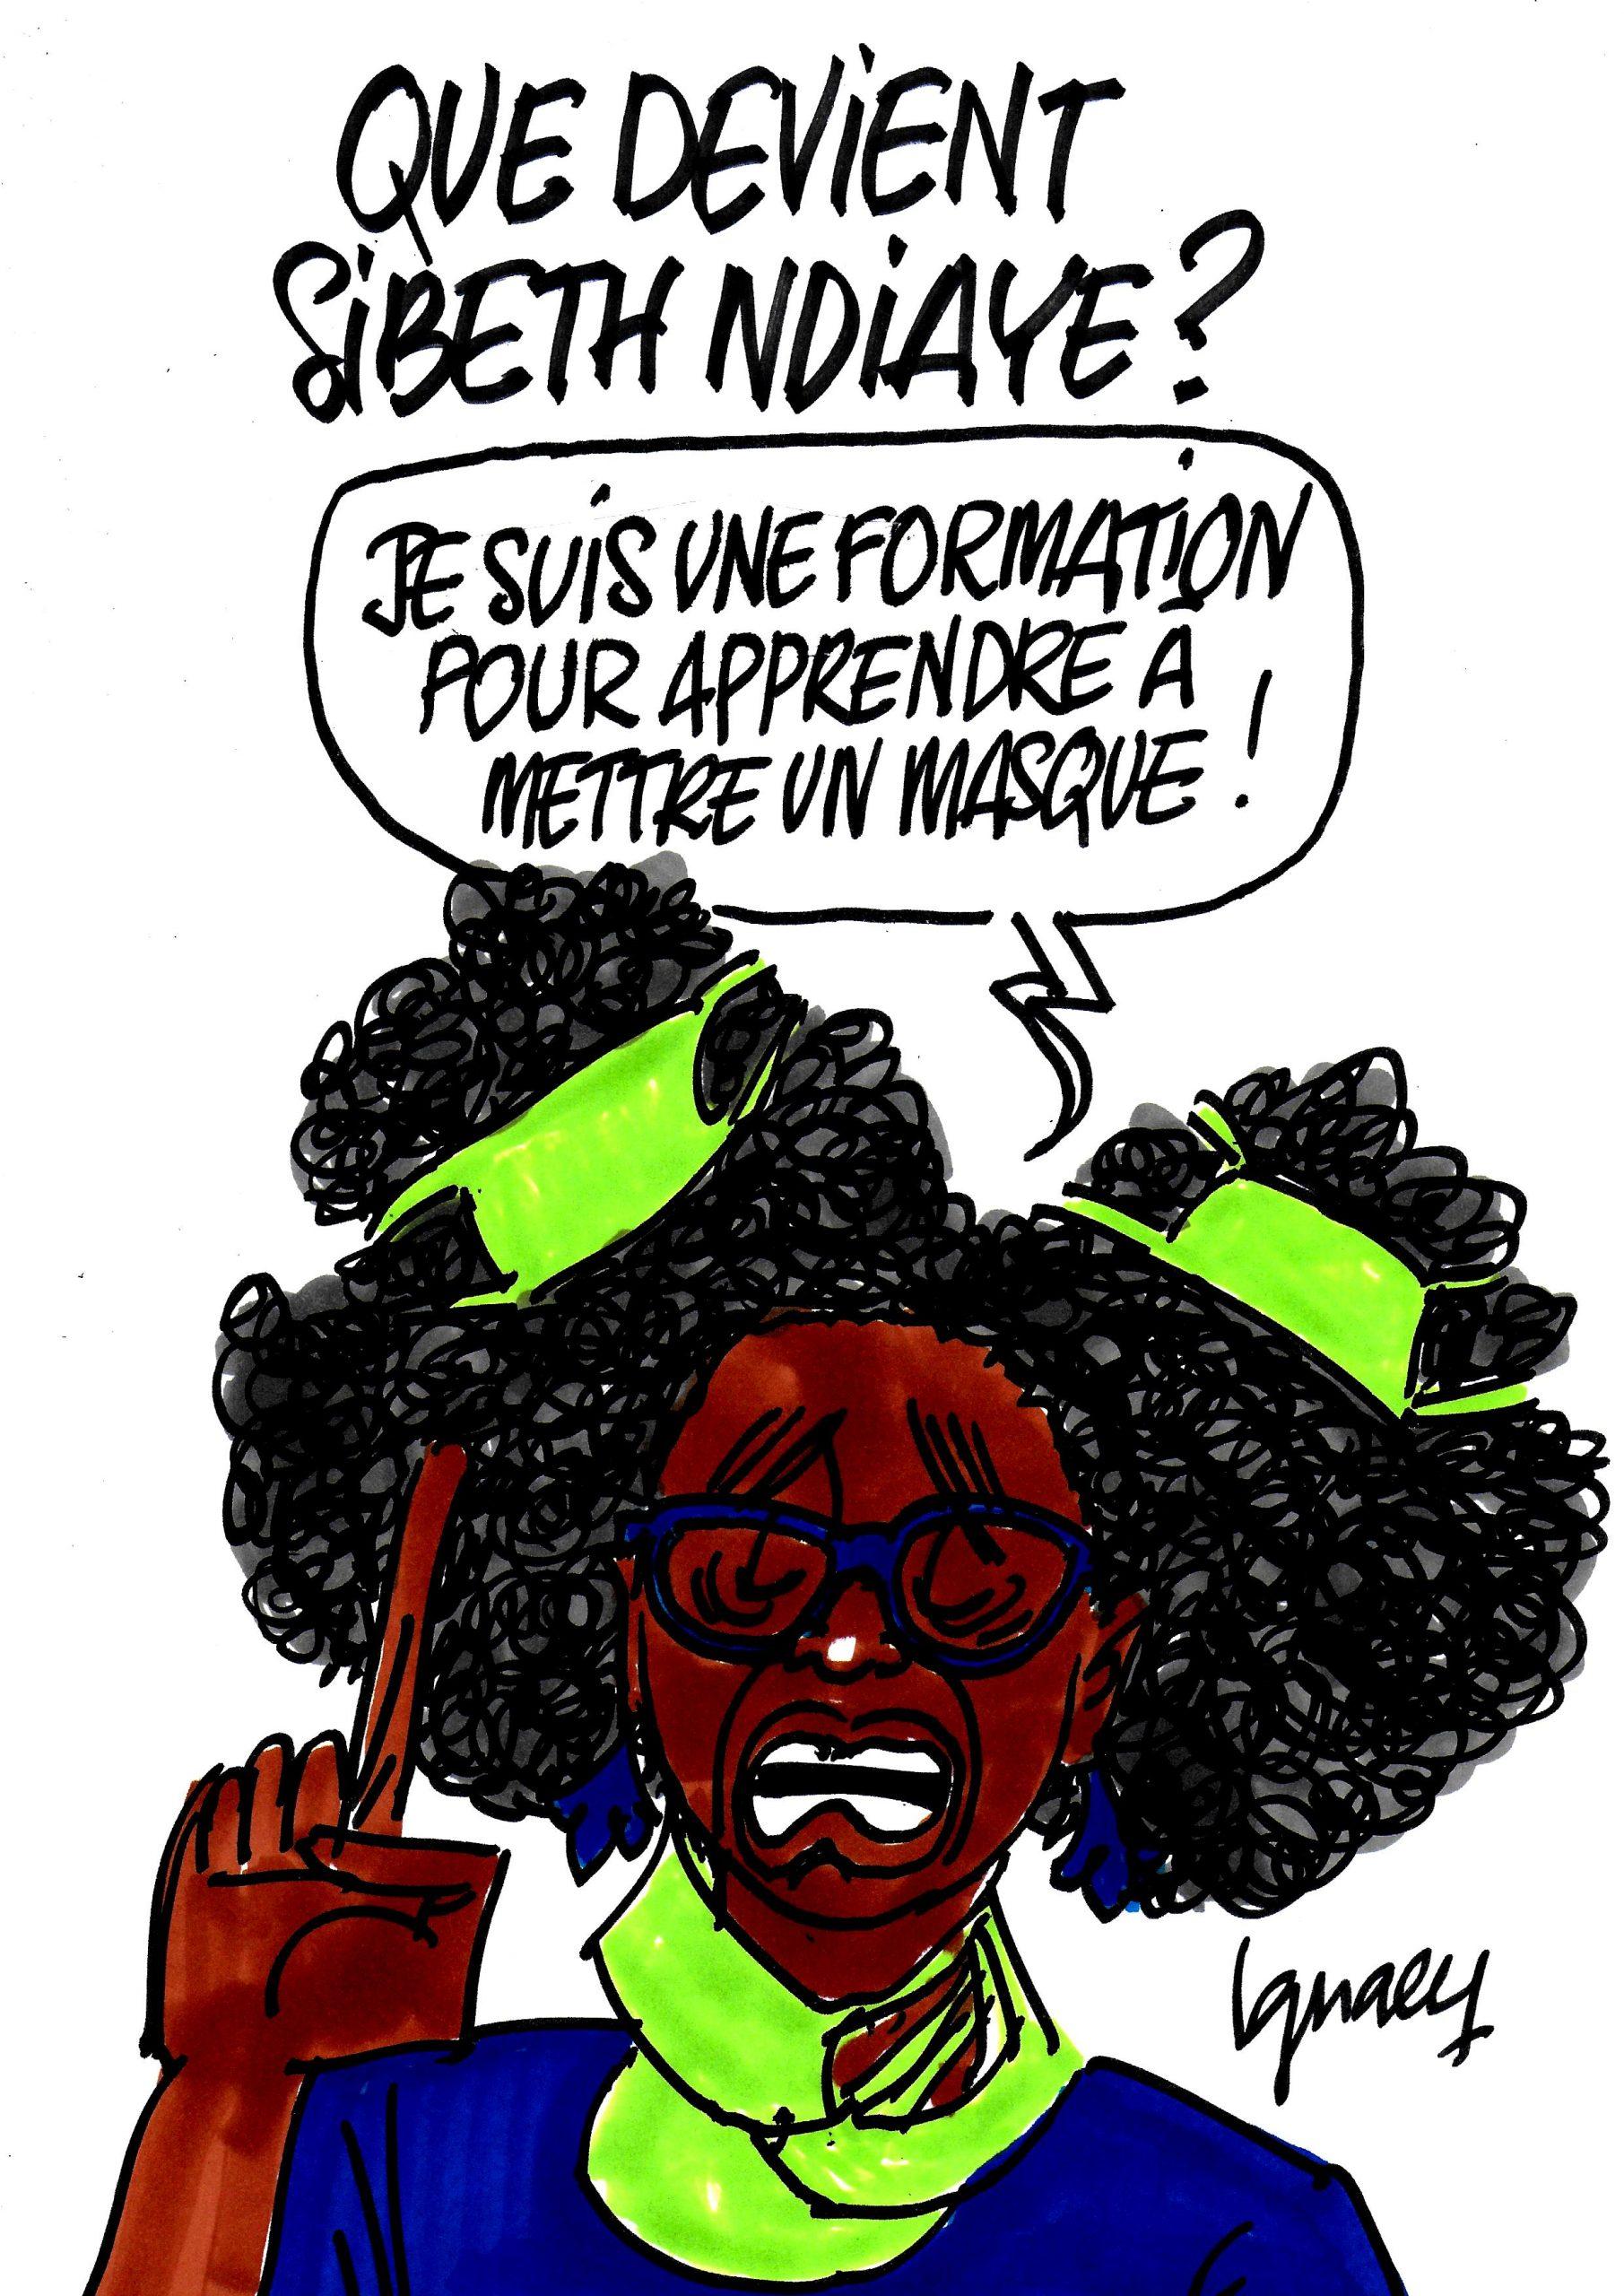 Ignace - Que devient Sibeth Ndiaye ?